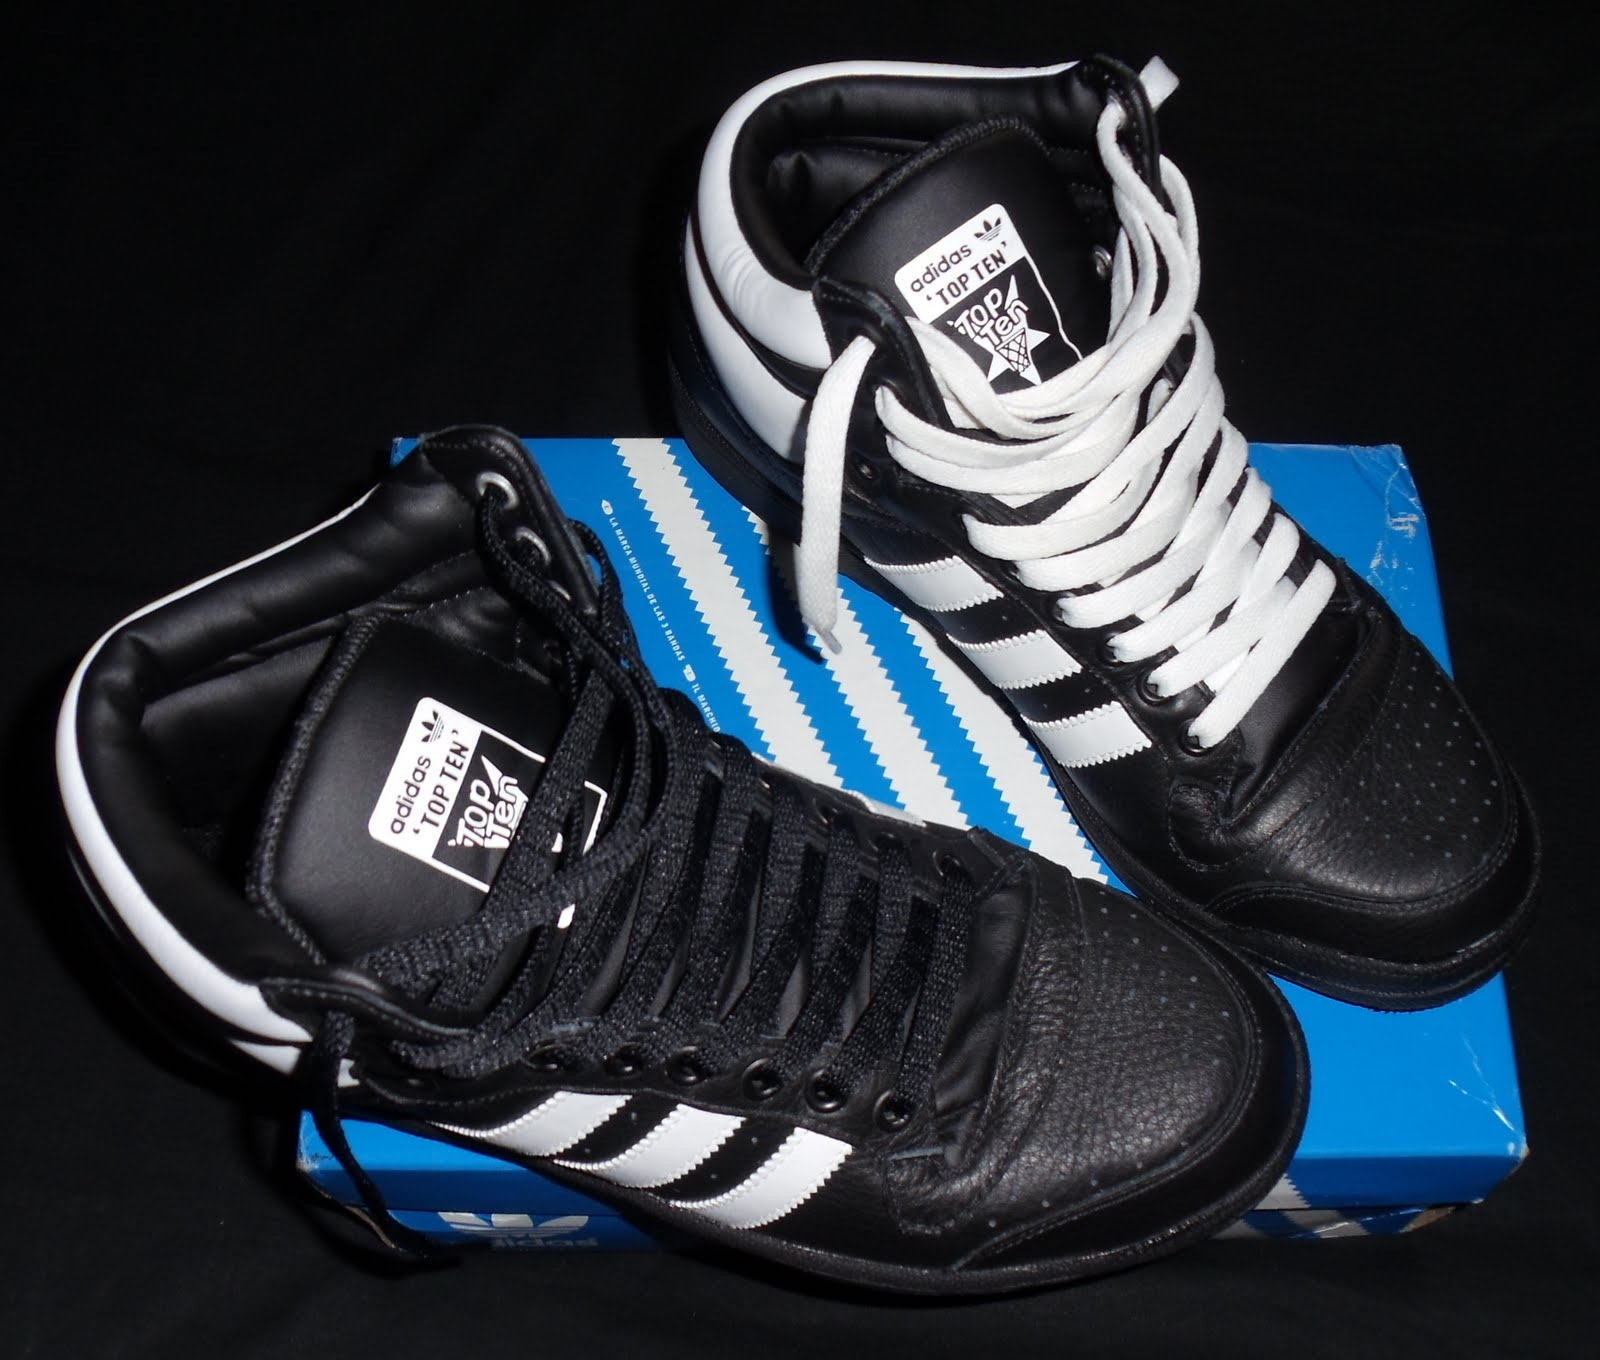 sports shoes d83e1 5b336 ... adidas-top-ten-black.html in marielladanielsen.github.com source ...